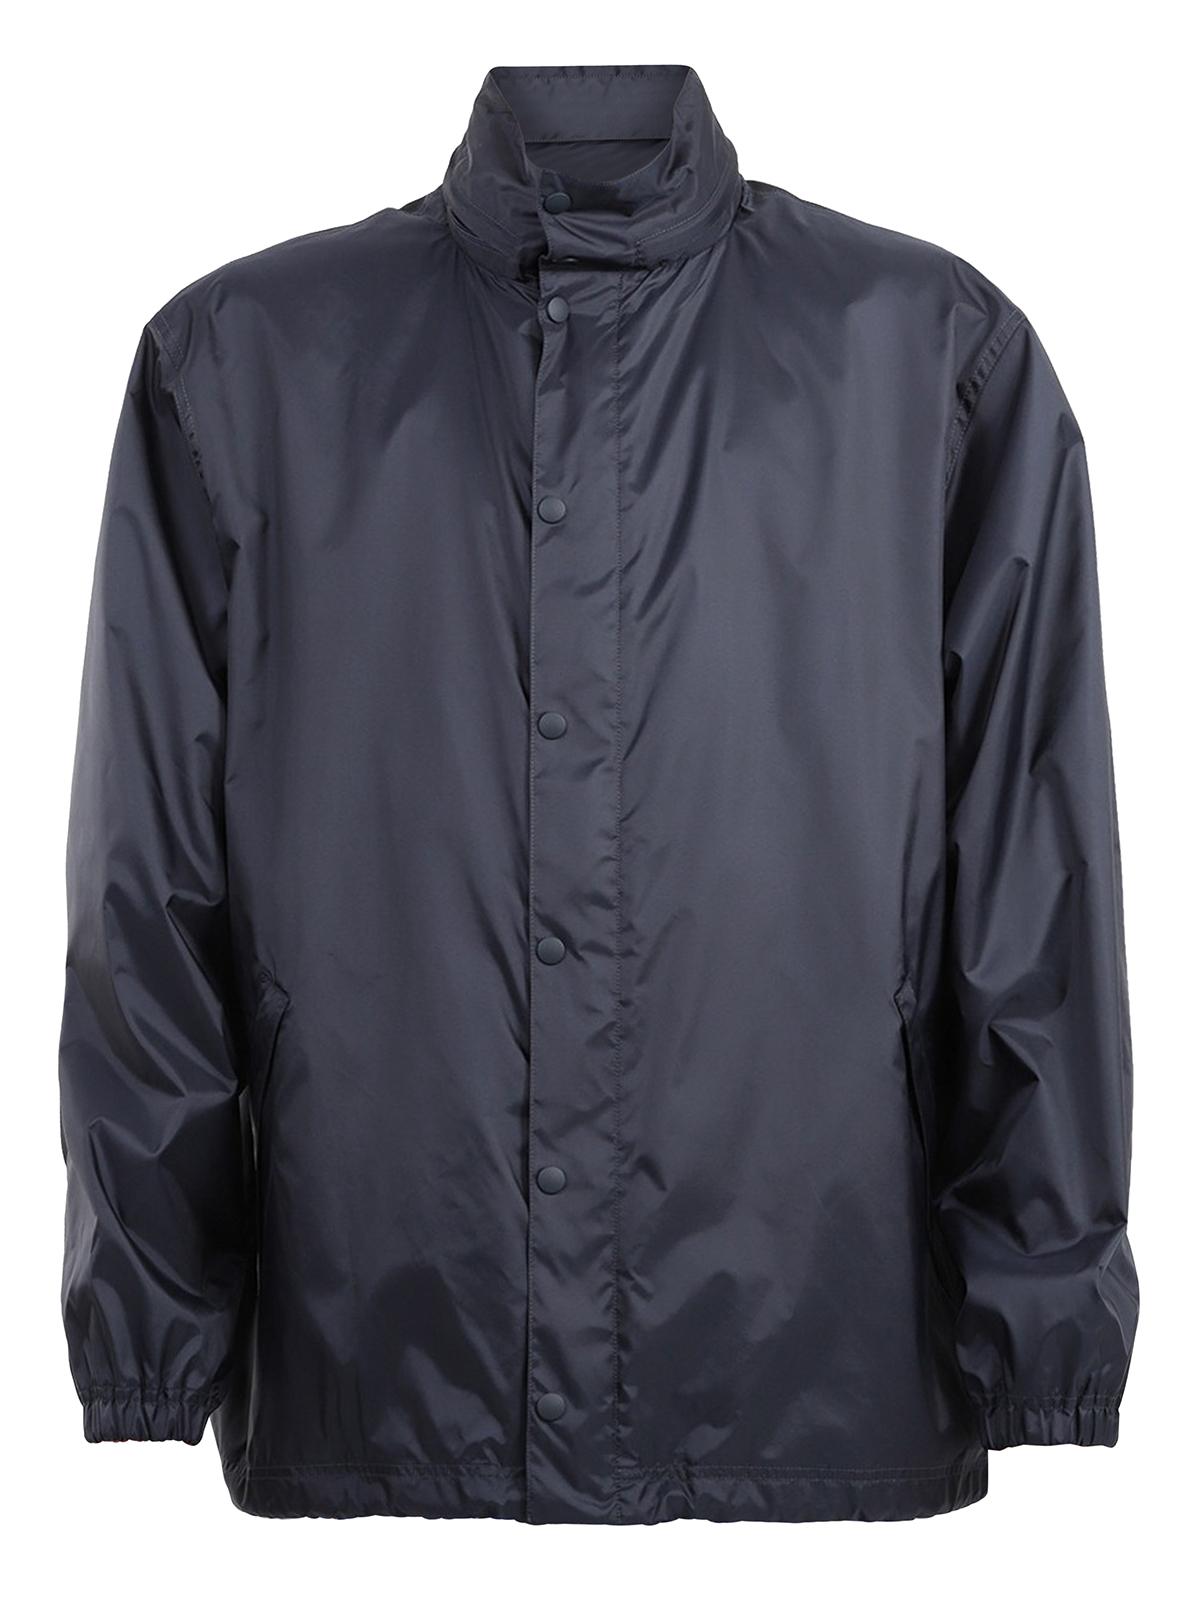 Balenciaga Jackets LANGUAGES WINDPROOF JACKET